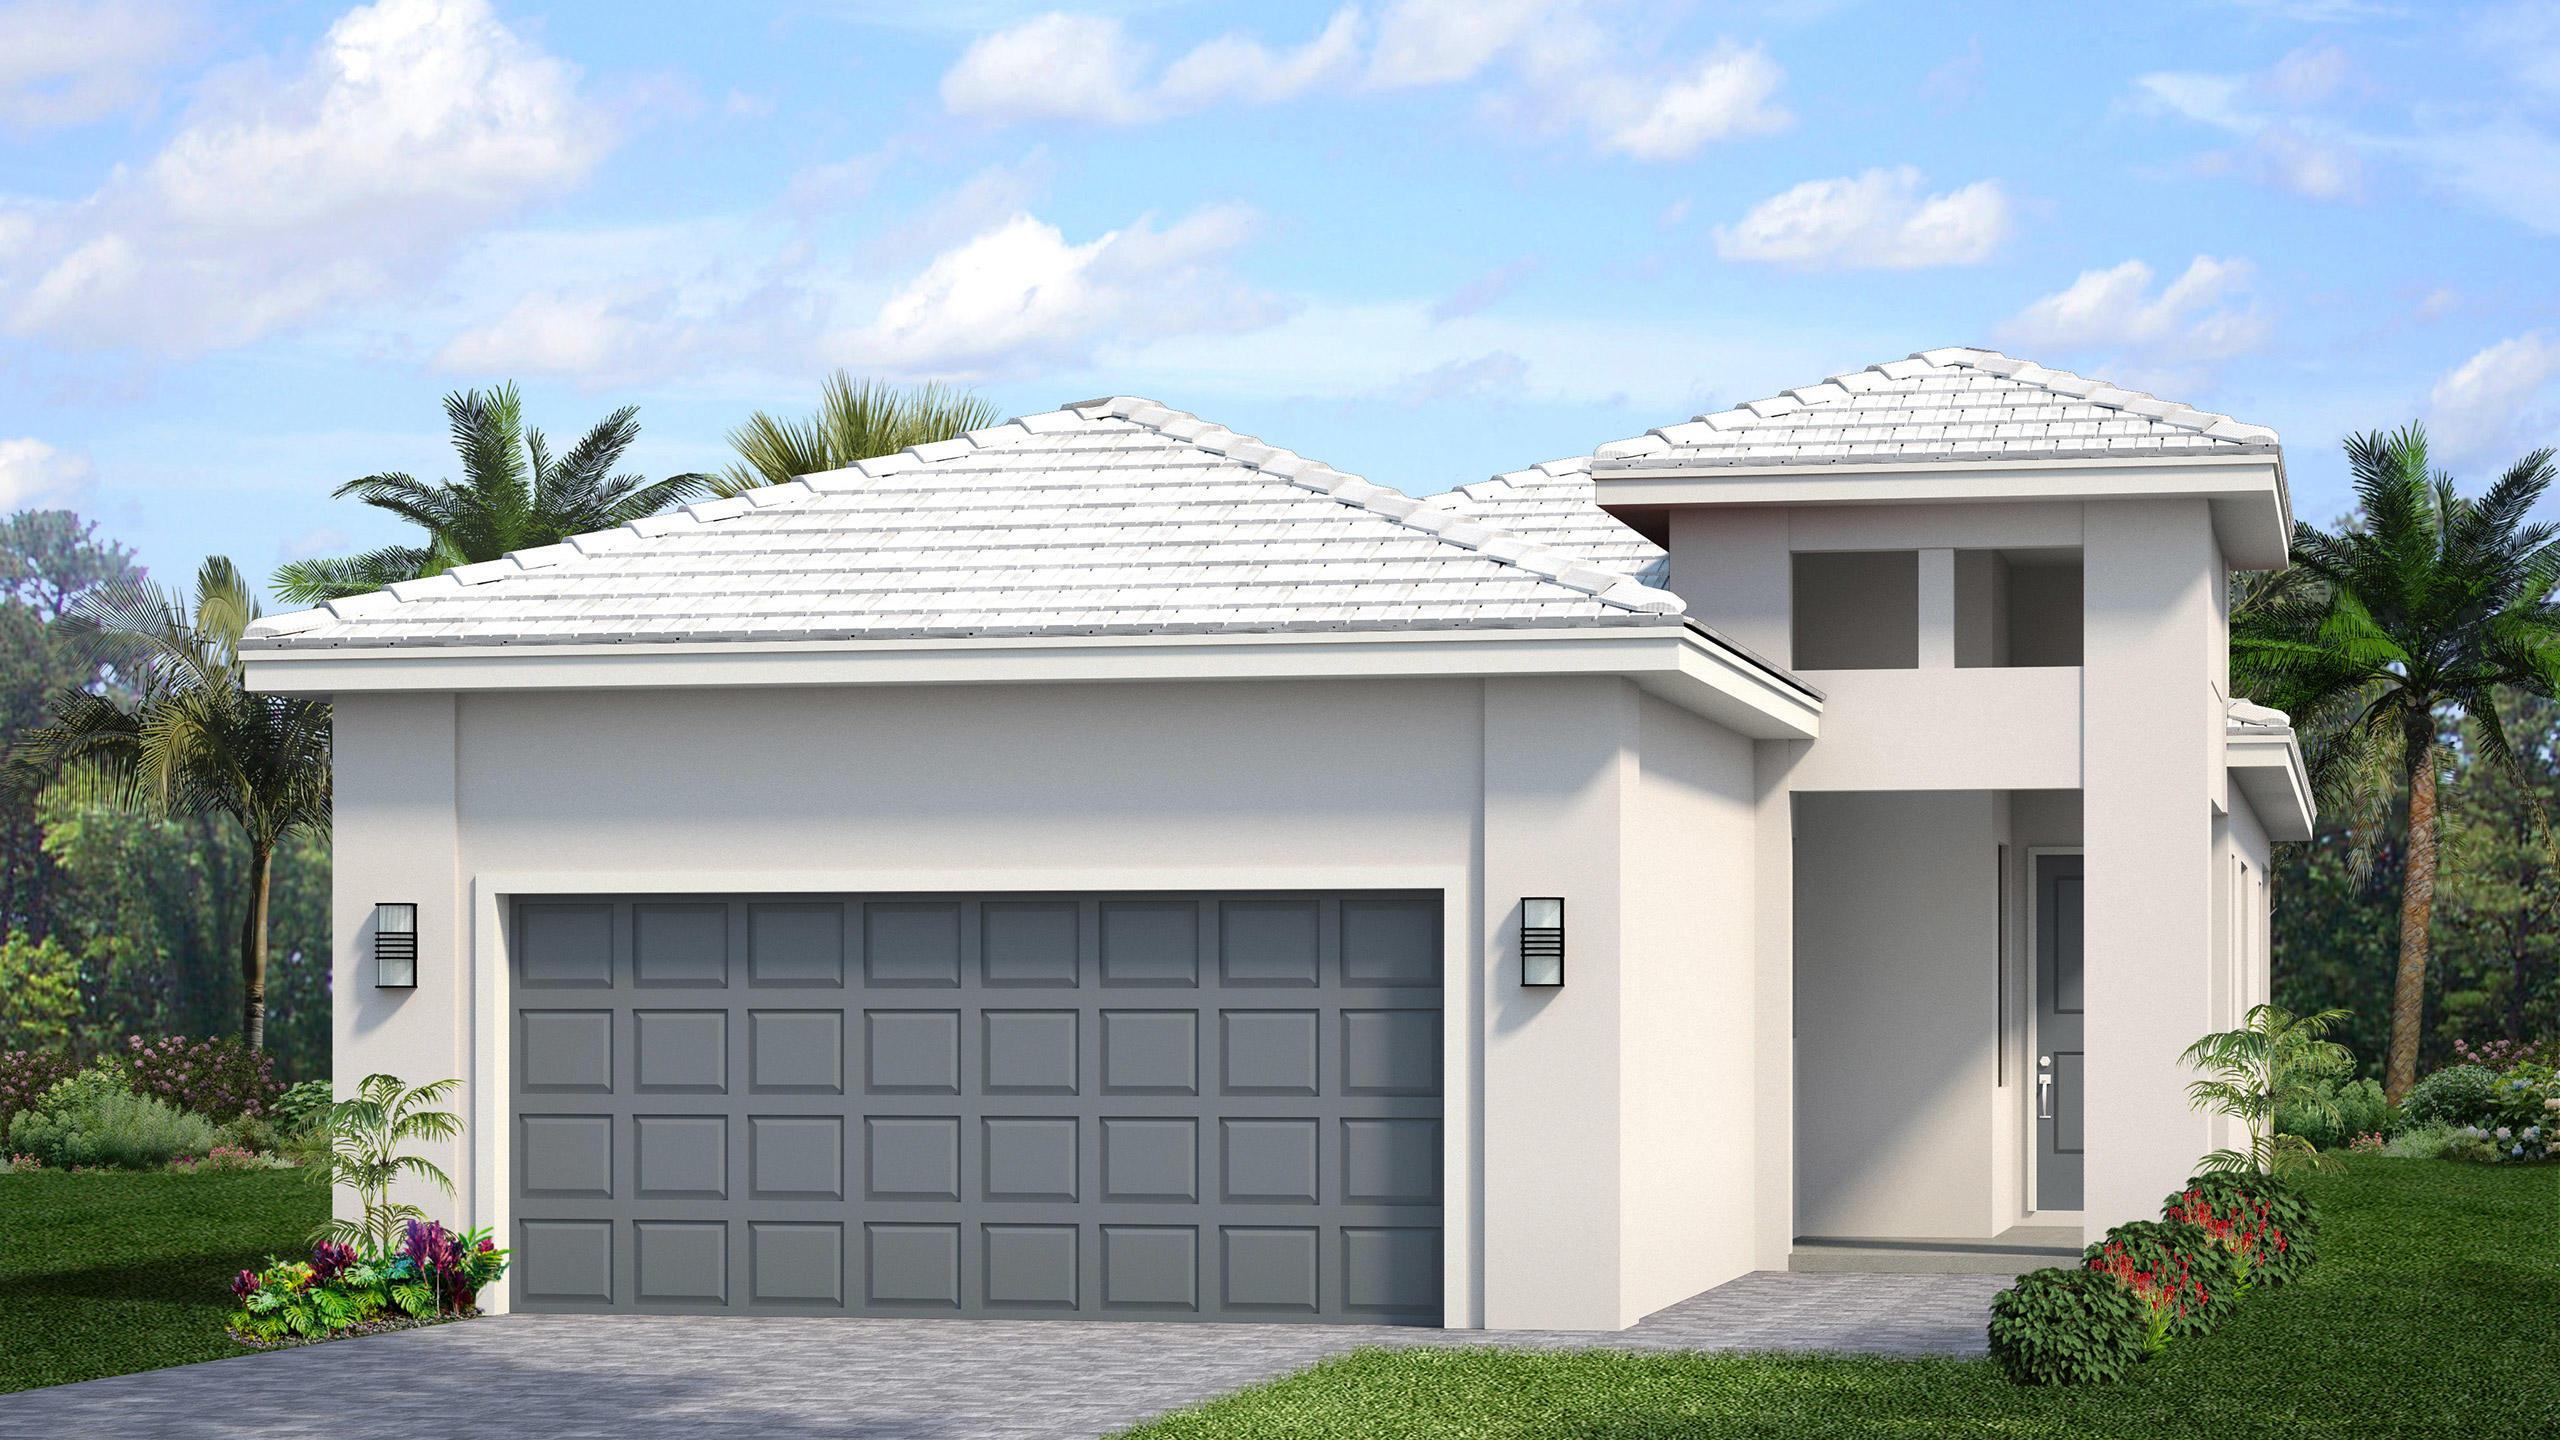 Photo of 5447 Santa Rosa Lane, Westlake, FL 33470